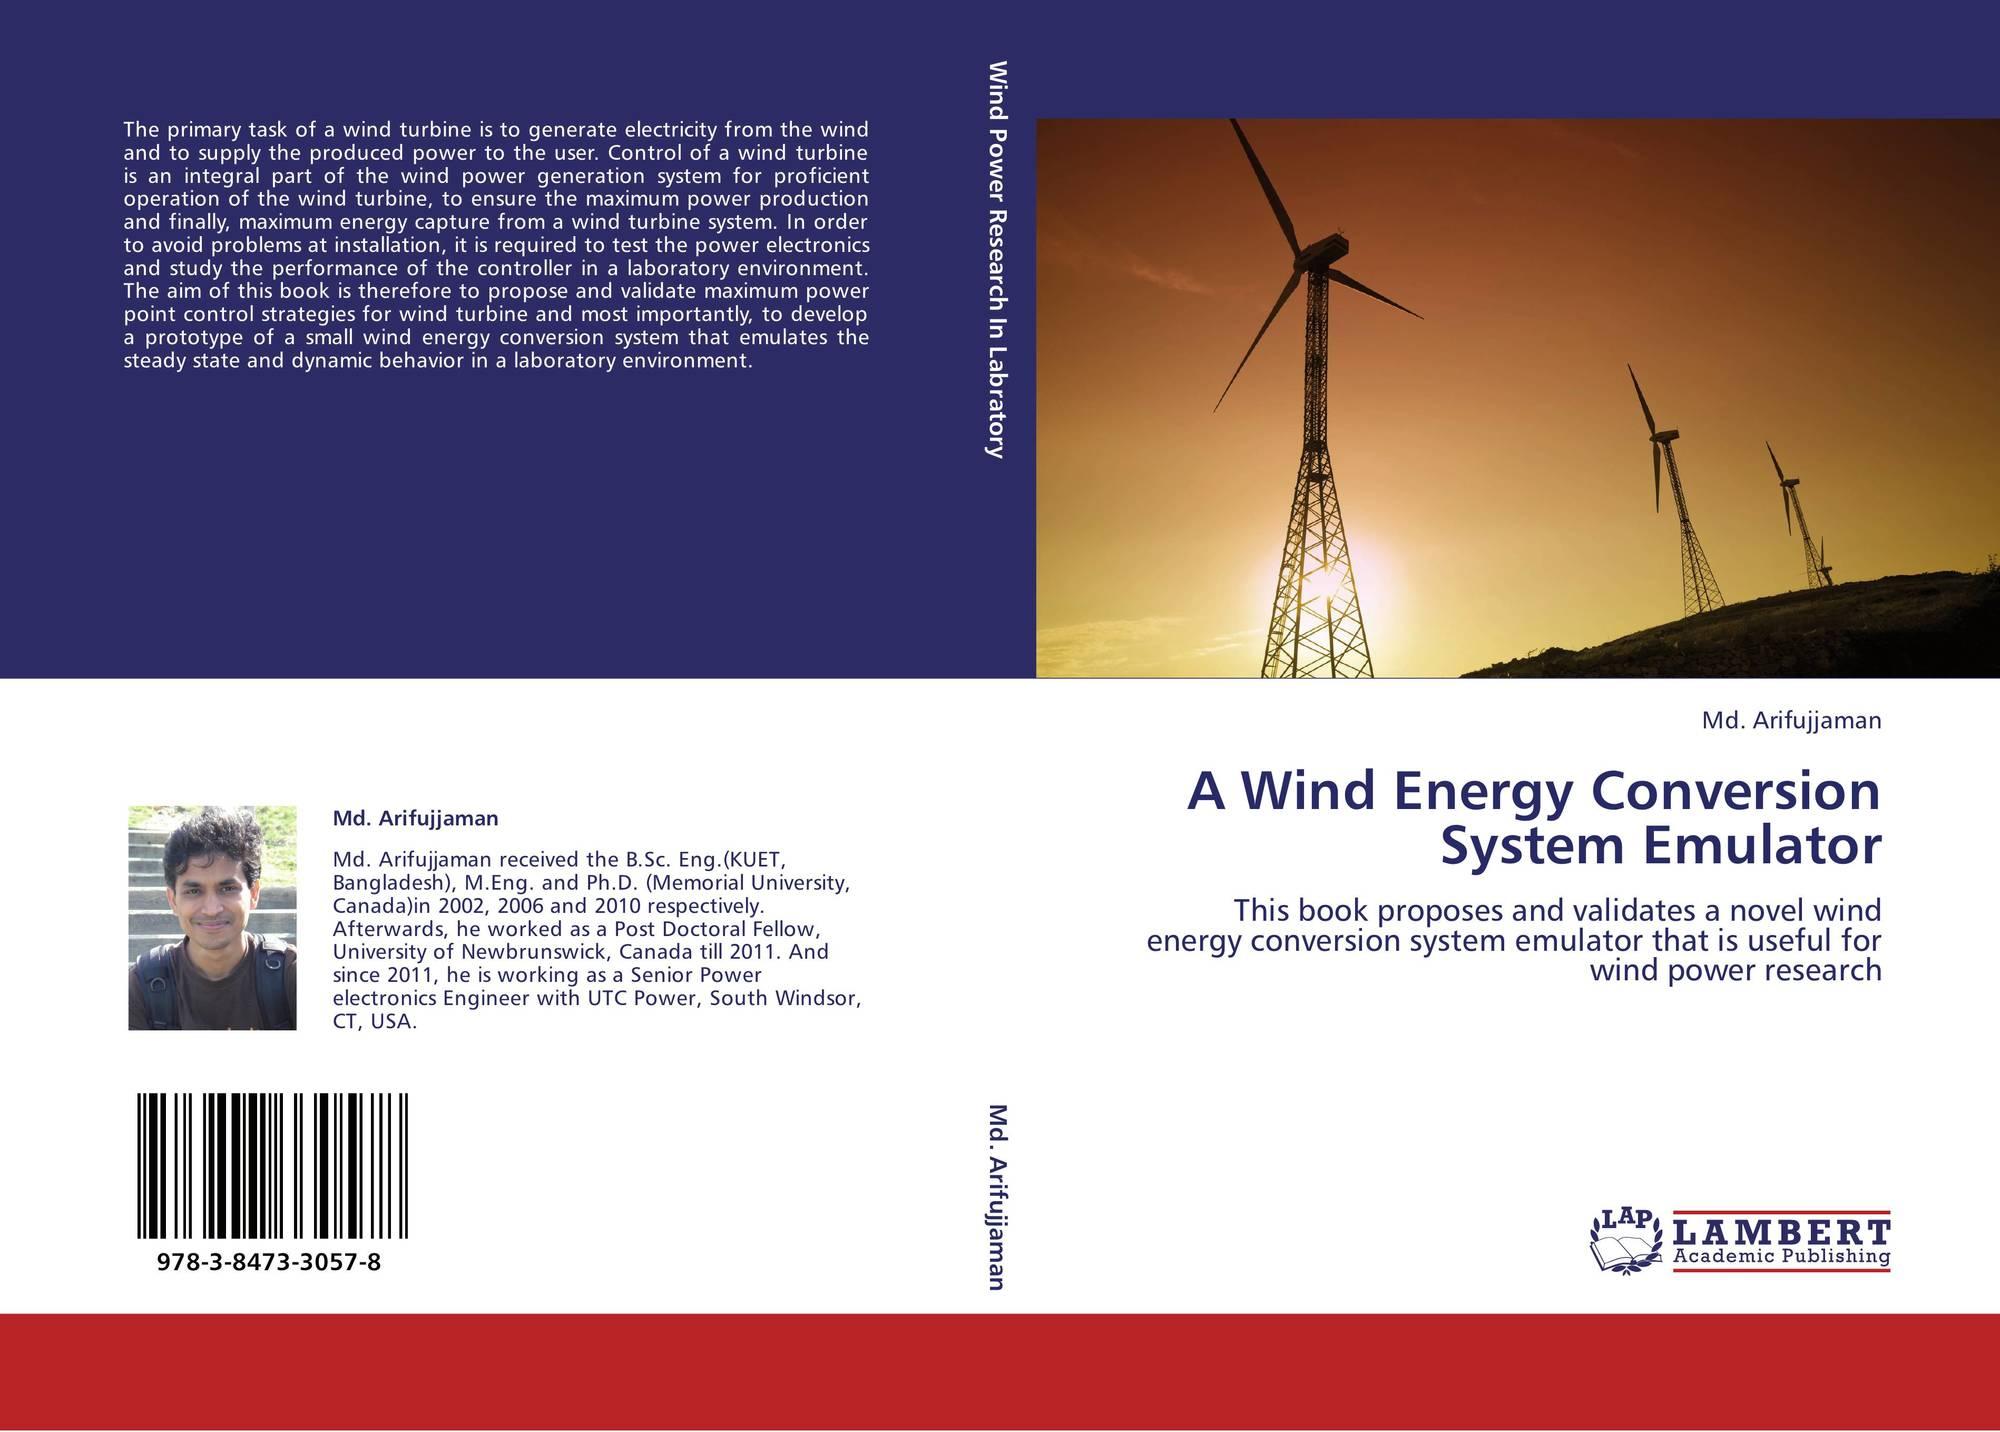 A Wind Energy Conversion System Emulator, 978-3-8473-3057-8